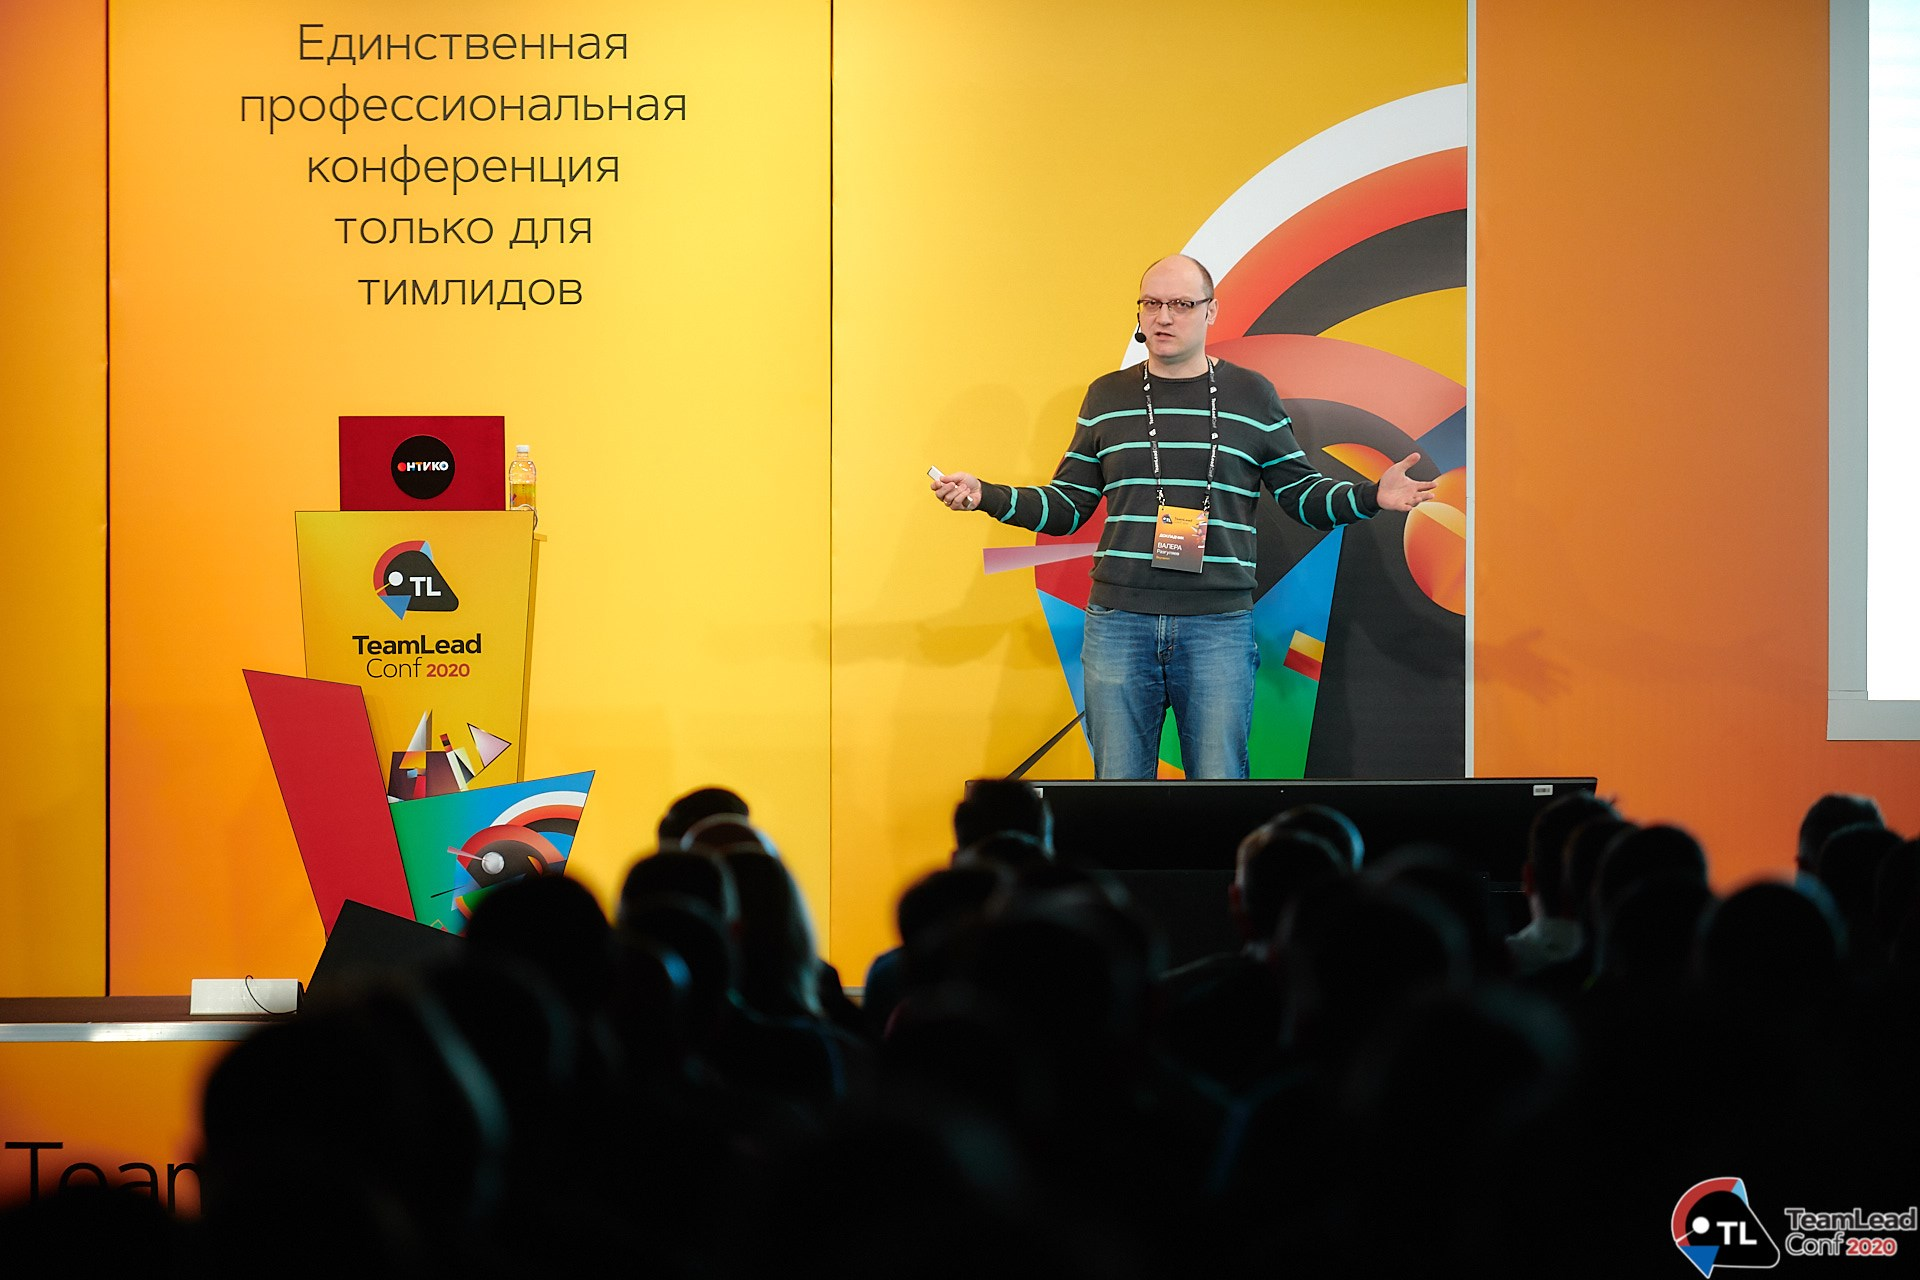 «Больше интерактива!» или Как прошел TeamLead Conf 2020 - 9